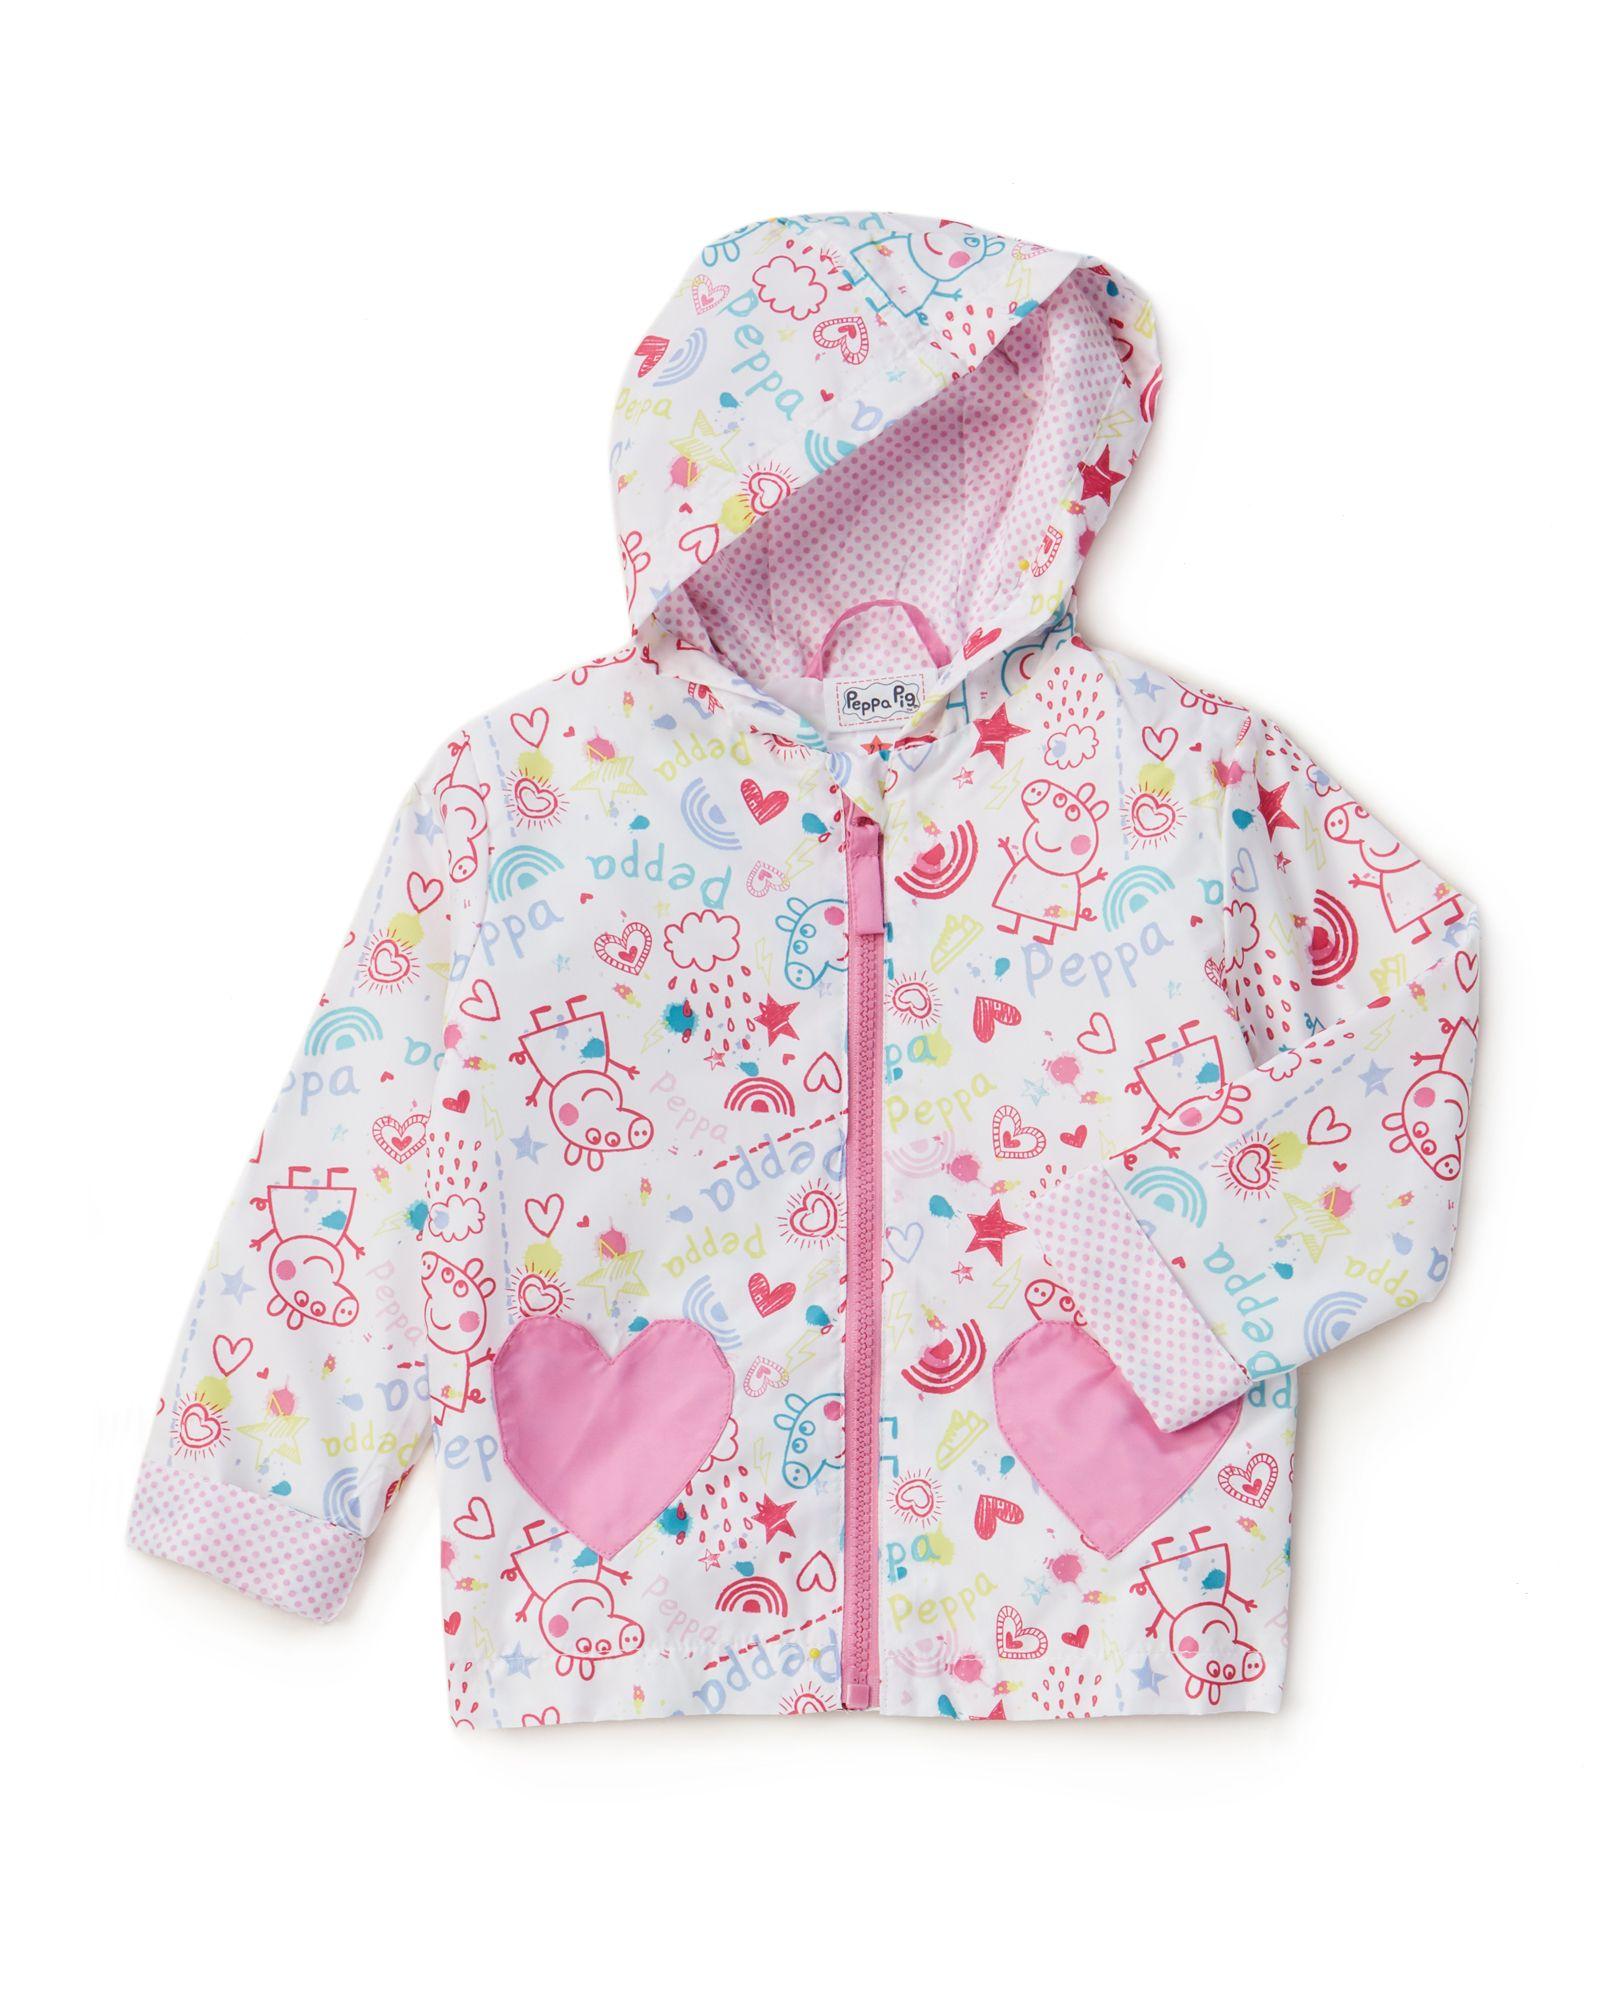 e161d7898cfe Toddler Girls) Printed Raincoat in 2019